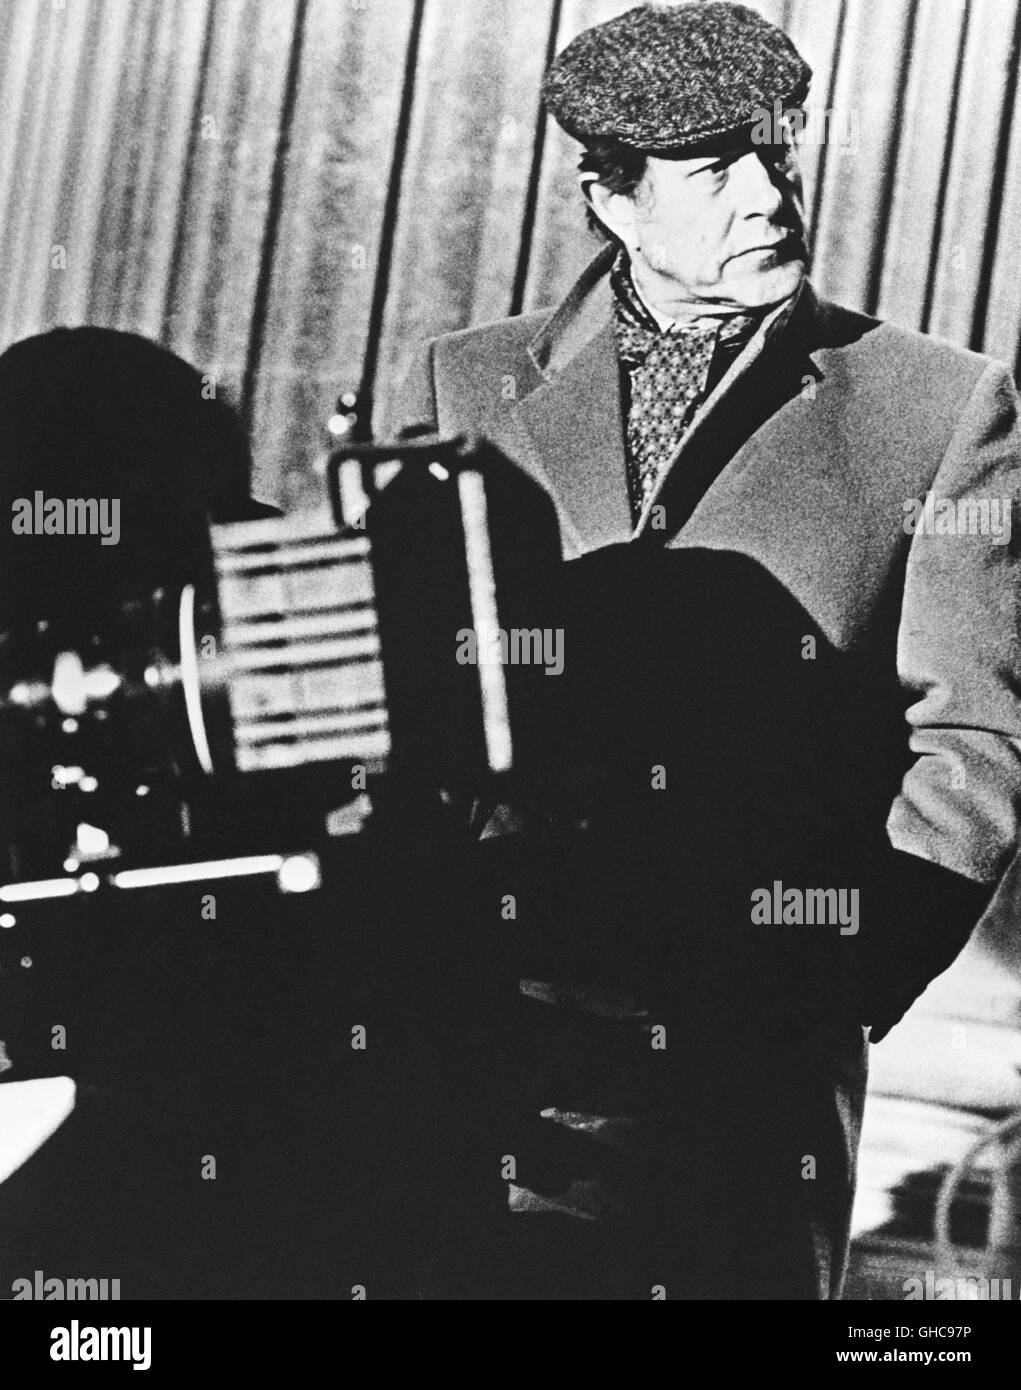 English Director NICHOLAS ROEG (ca. 1990s)Stock Photo